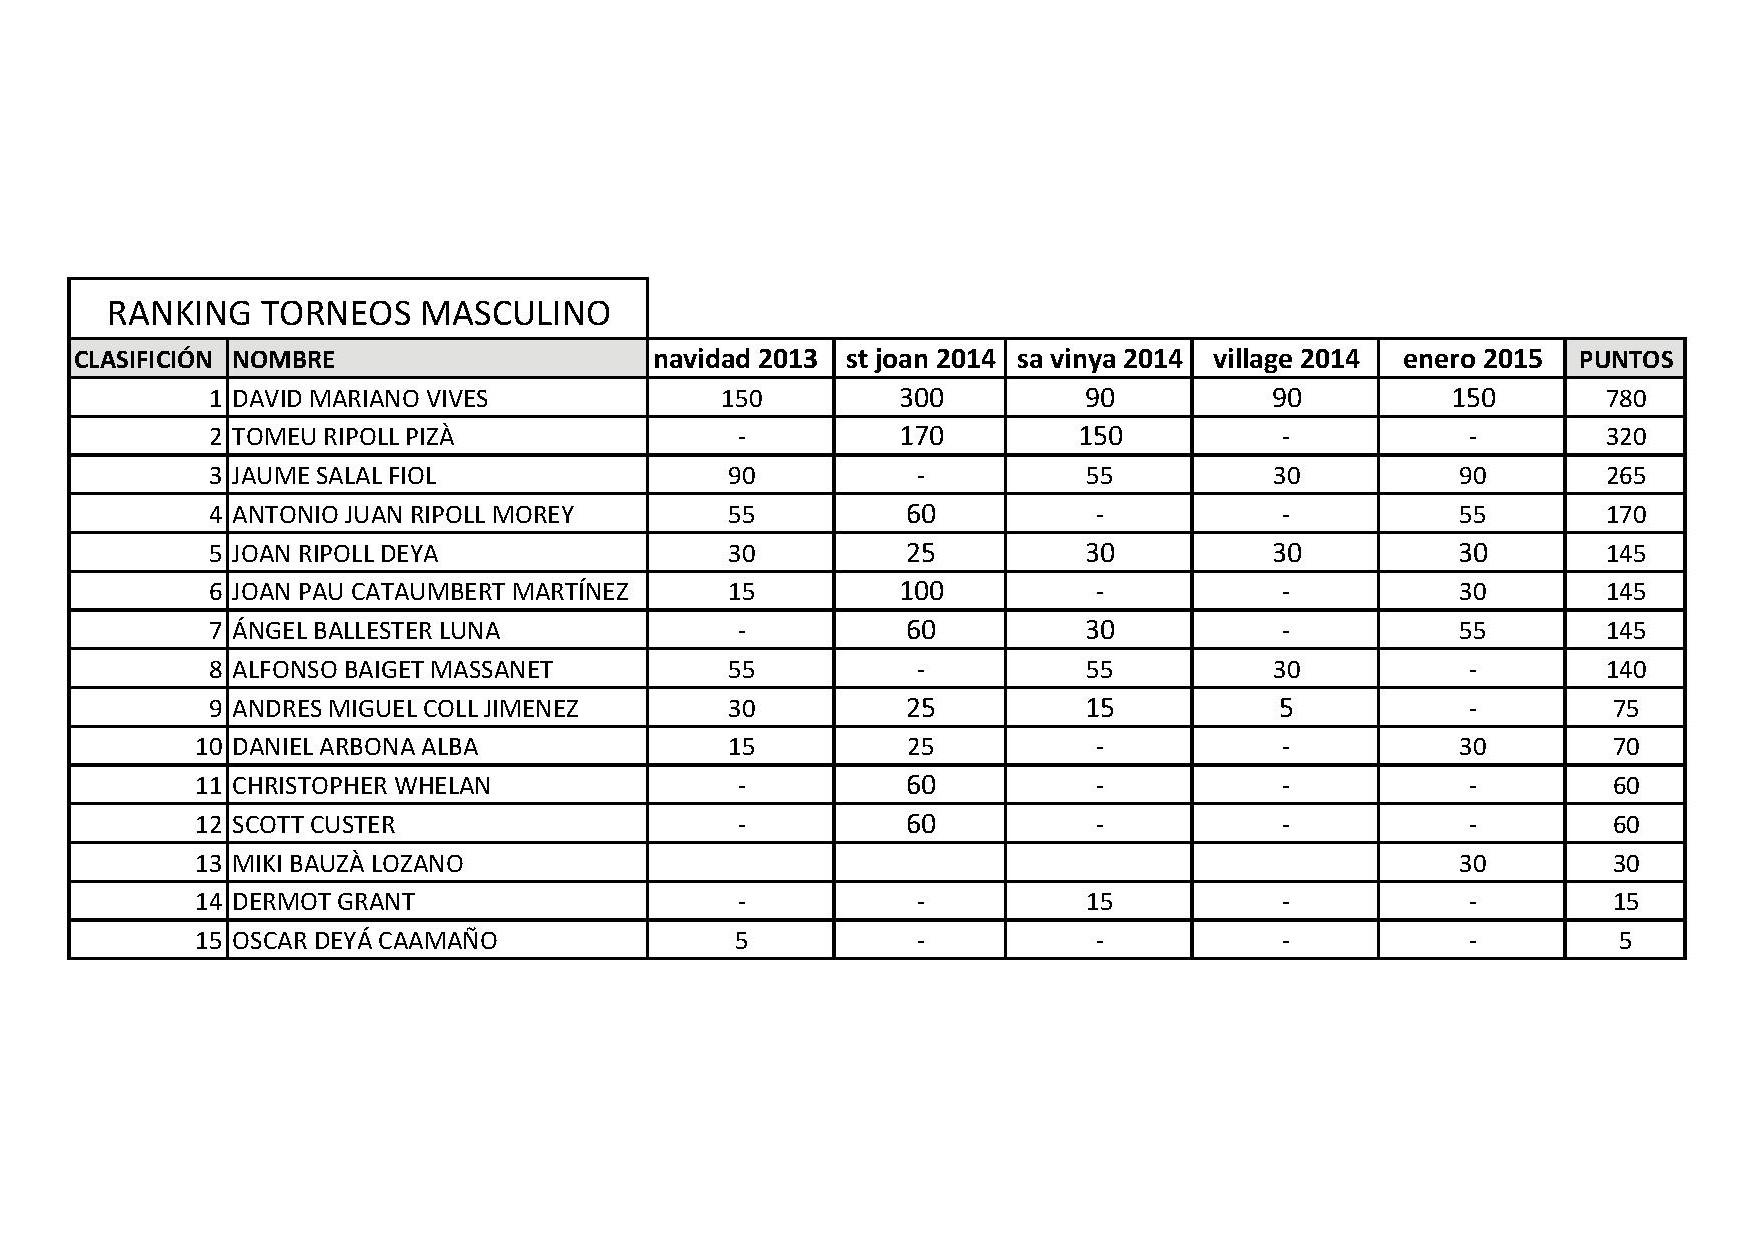 RANKING TORNEO MASCULINO